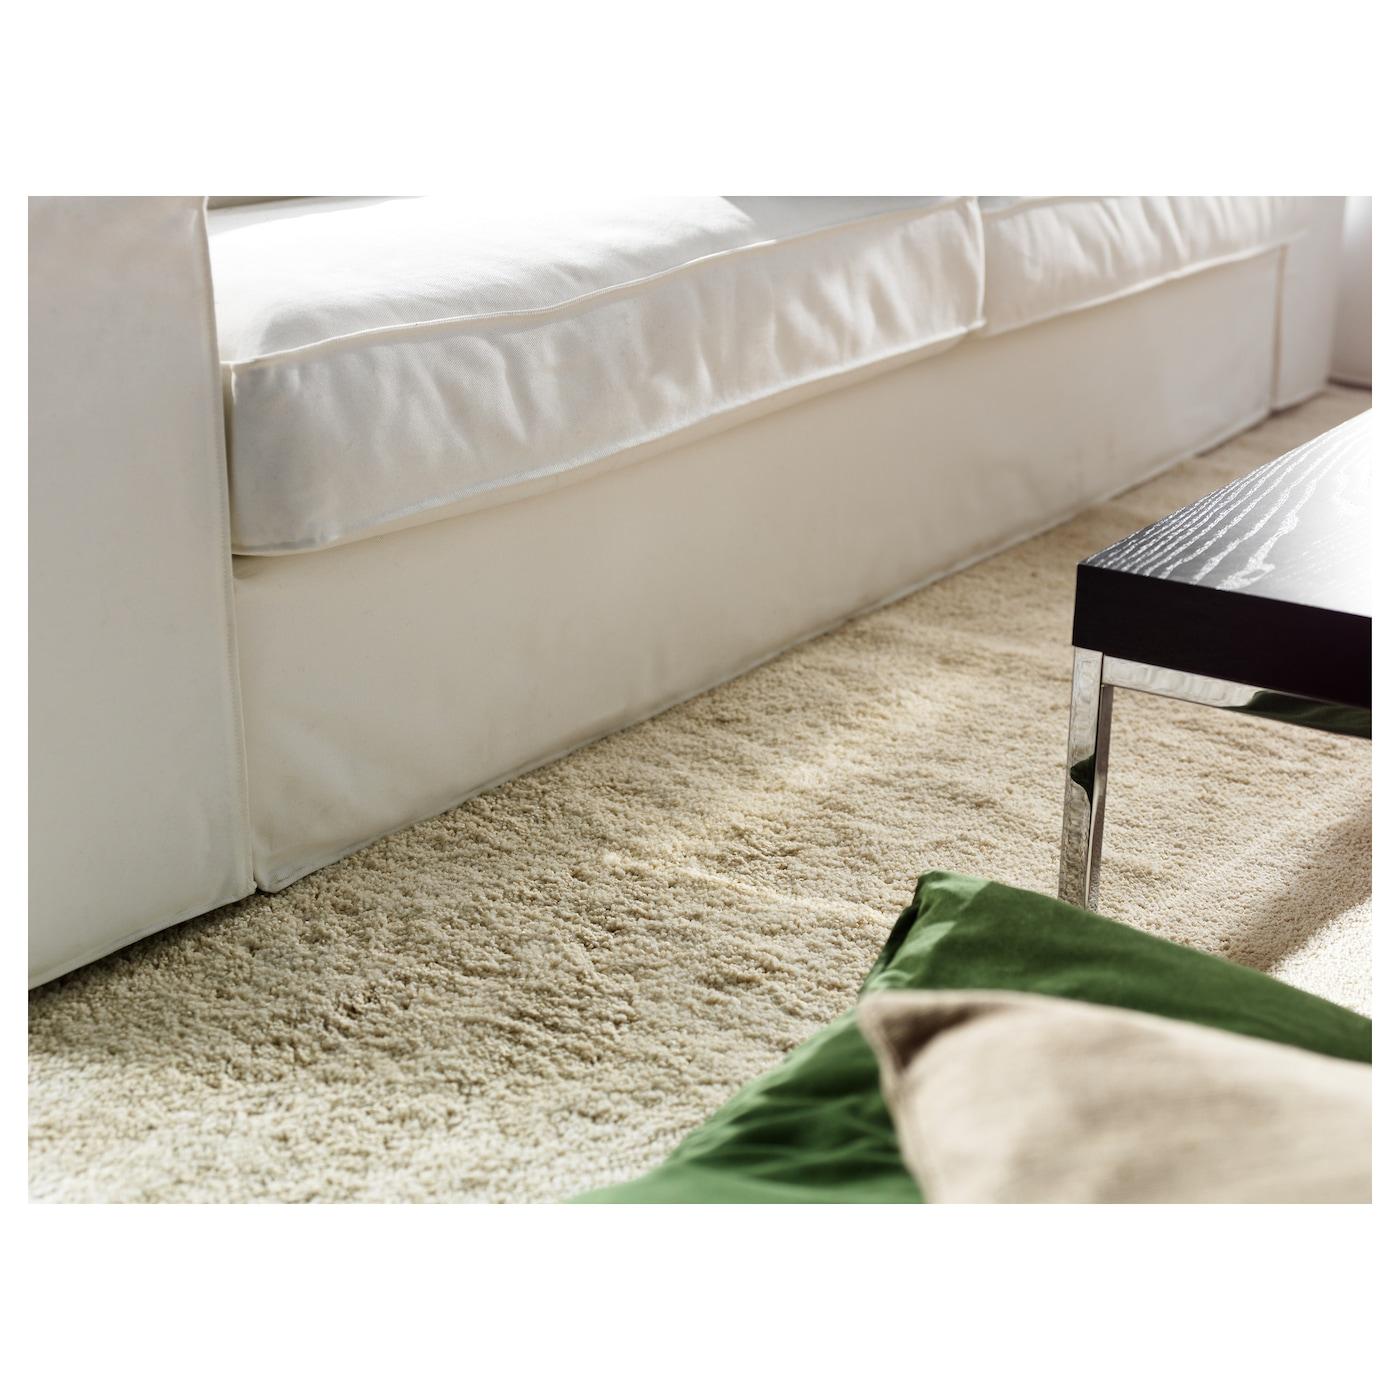 Ikea Off White Area Rug: ÅDUM Rug, High Pile Off-white 200x300 Cm